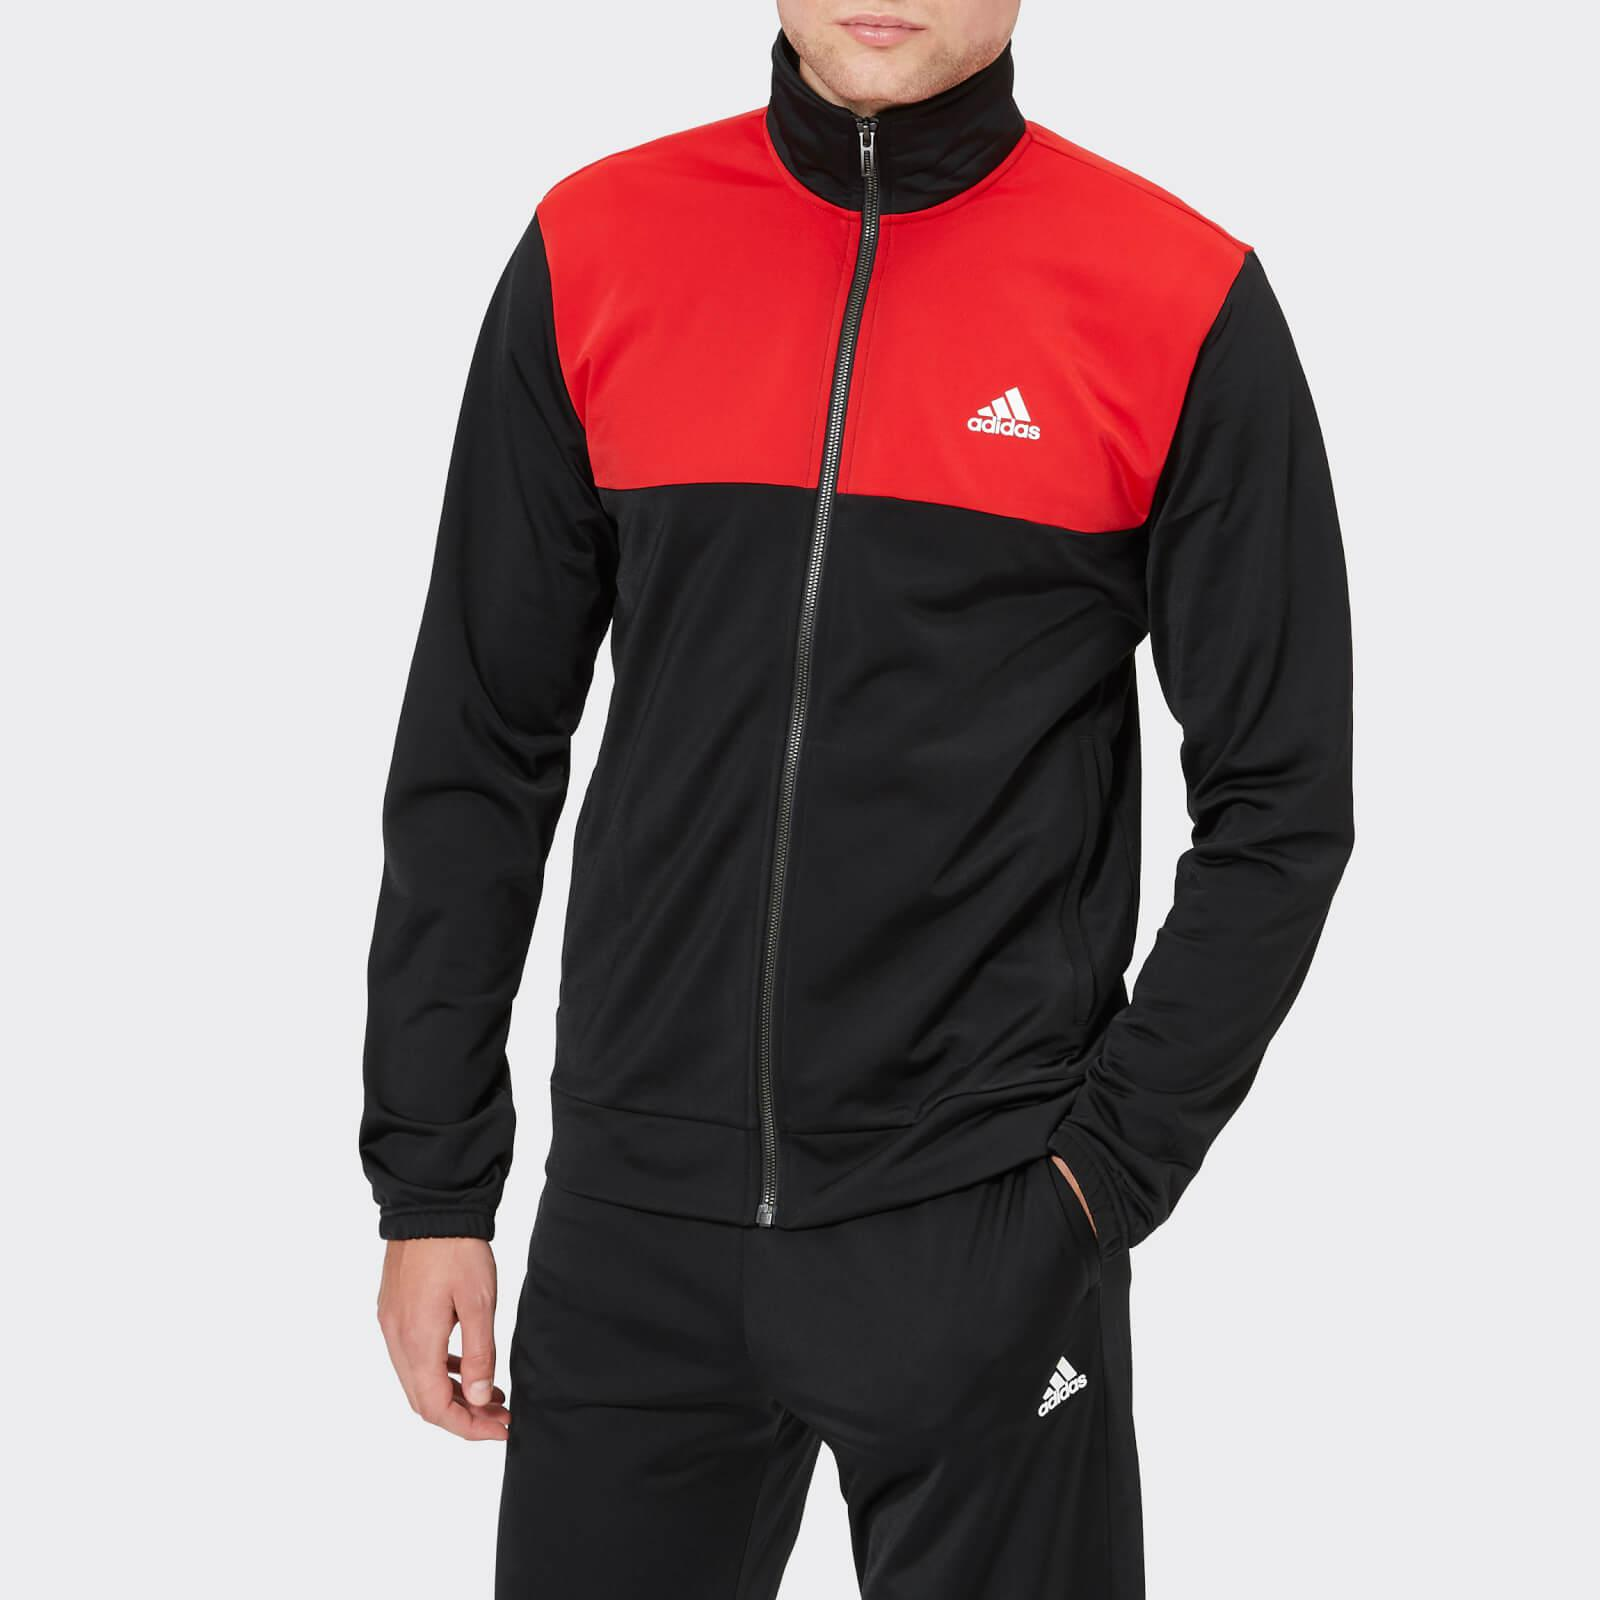 cde8b45289bd adidas Back 2 Basics Tracksuit in Black for Men - Lyst